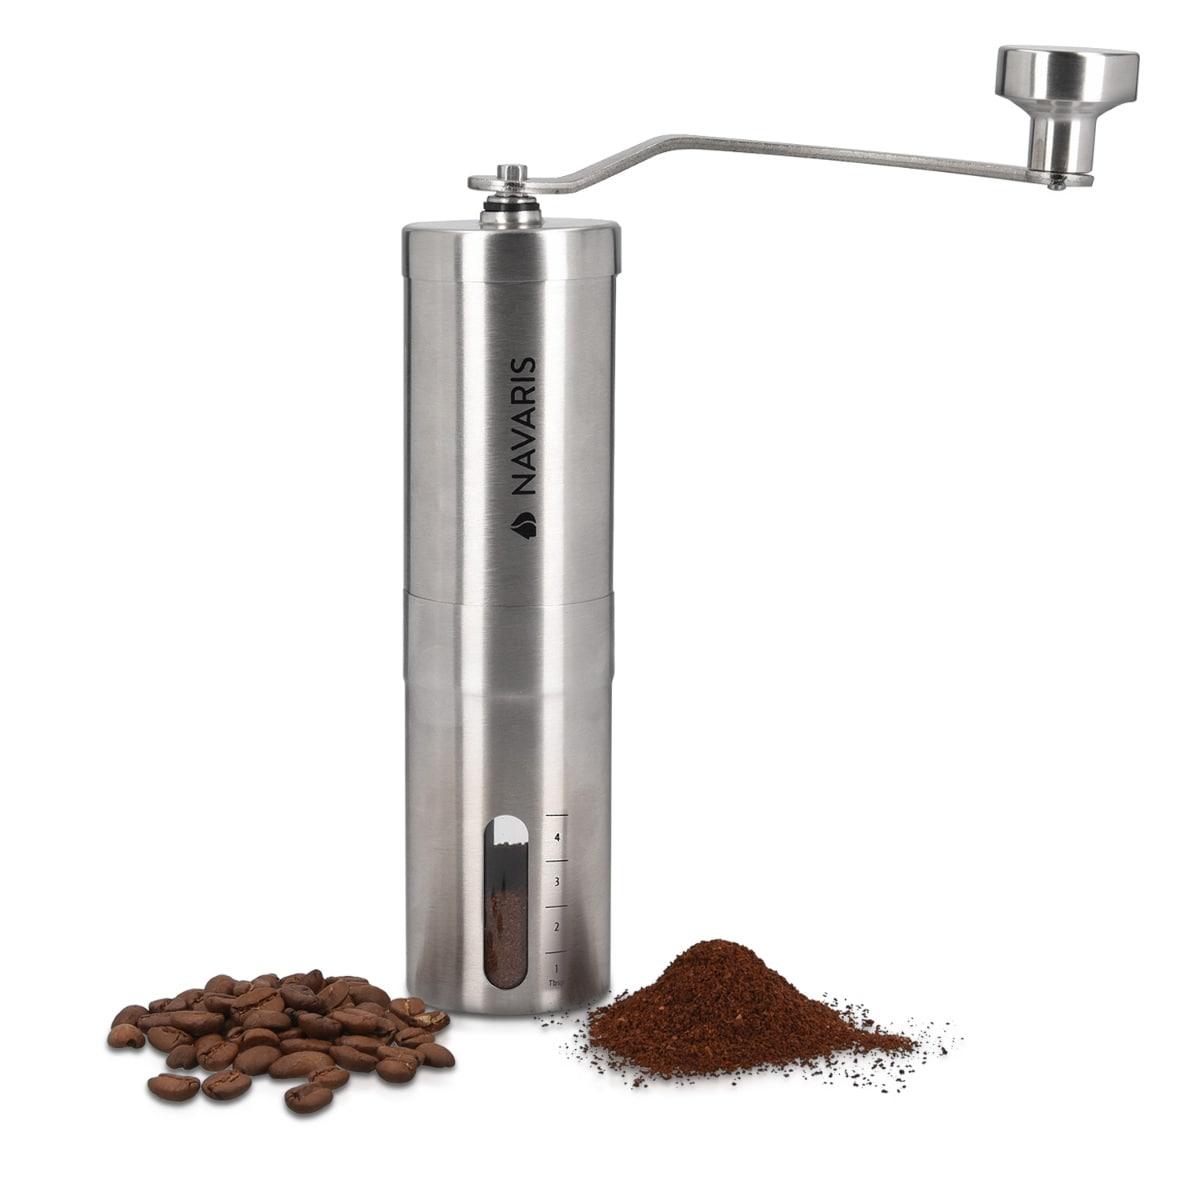 Manuelle Kaffeemühle Edelstahl mit Keramikmahlwerk - silber